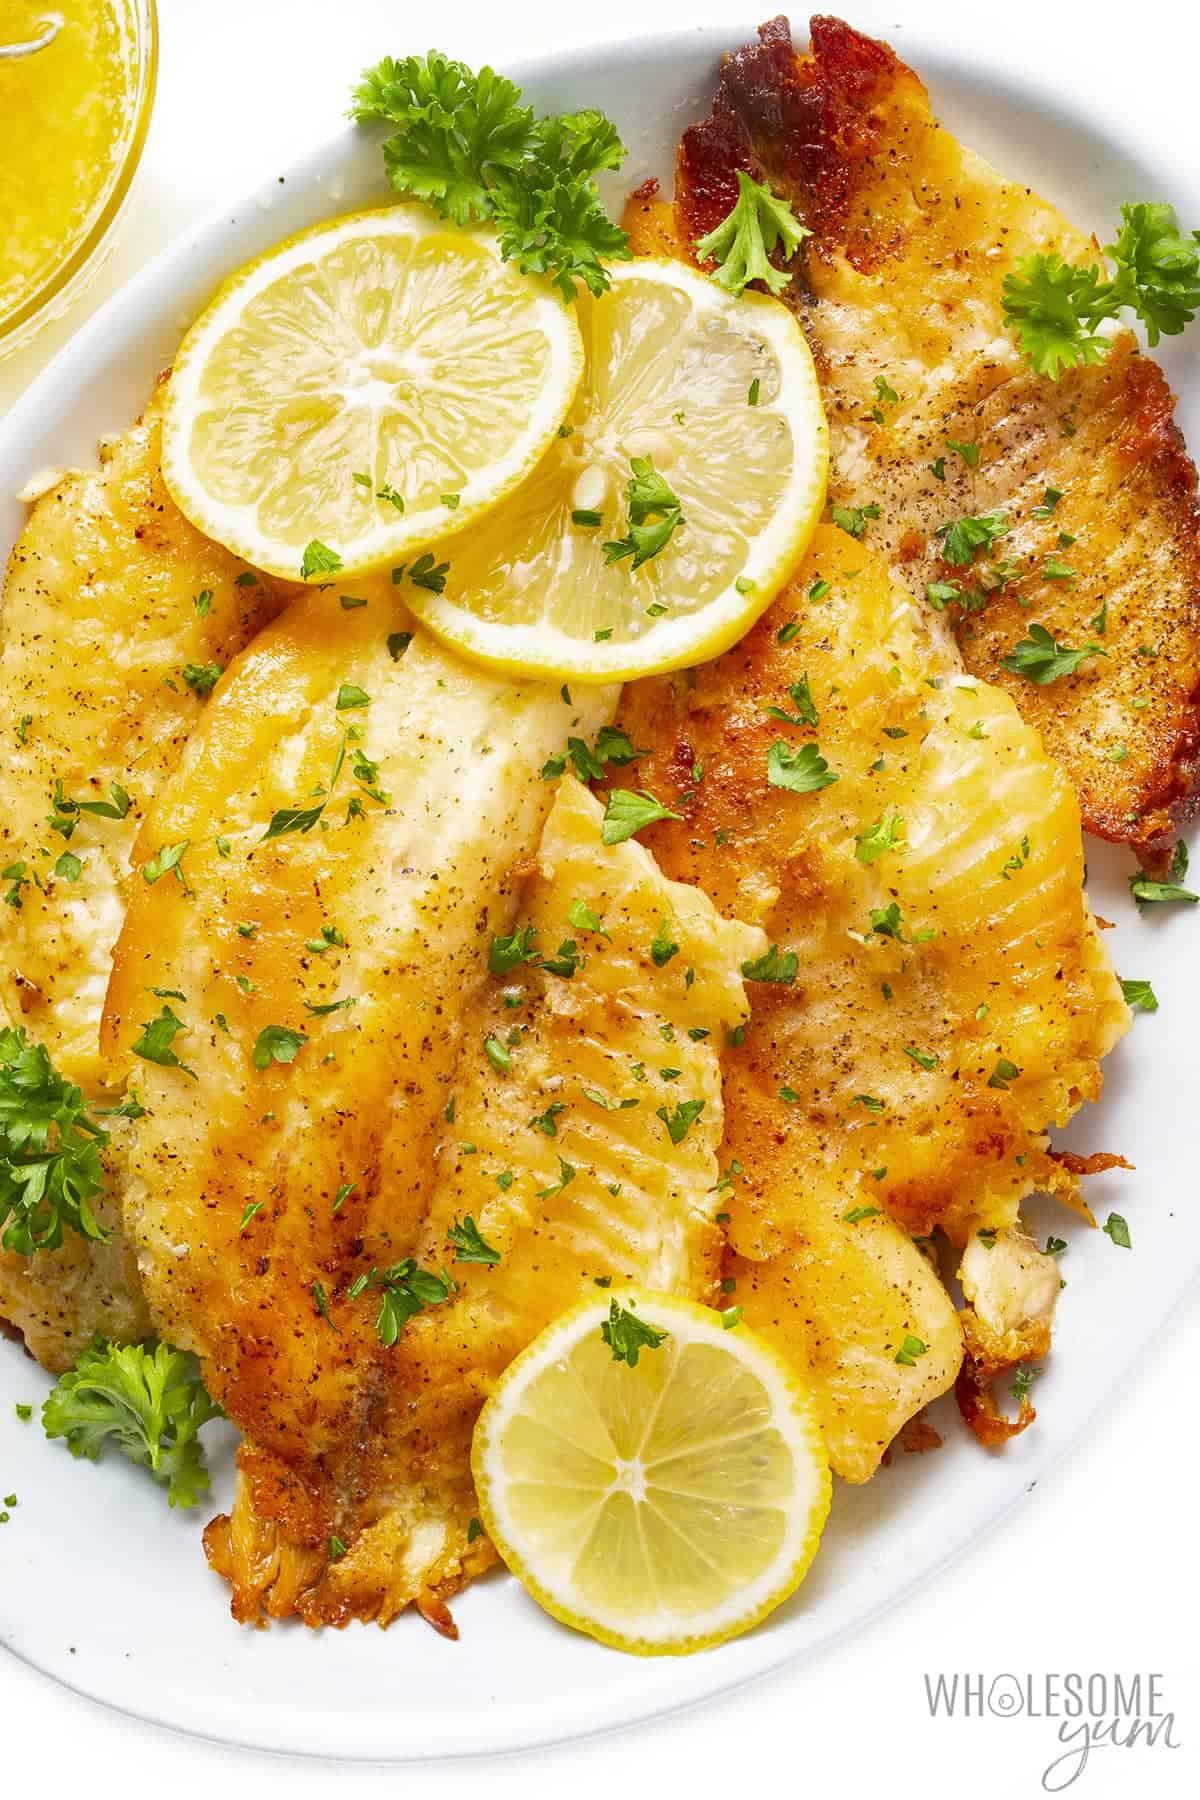 Pan fried tilapia fillets on a platter with lemon slices